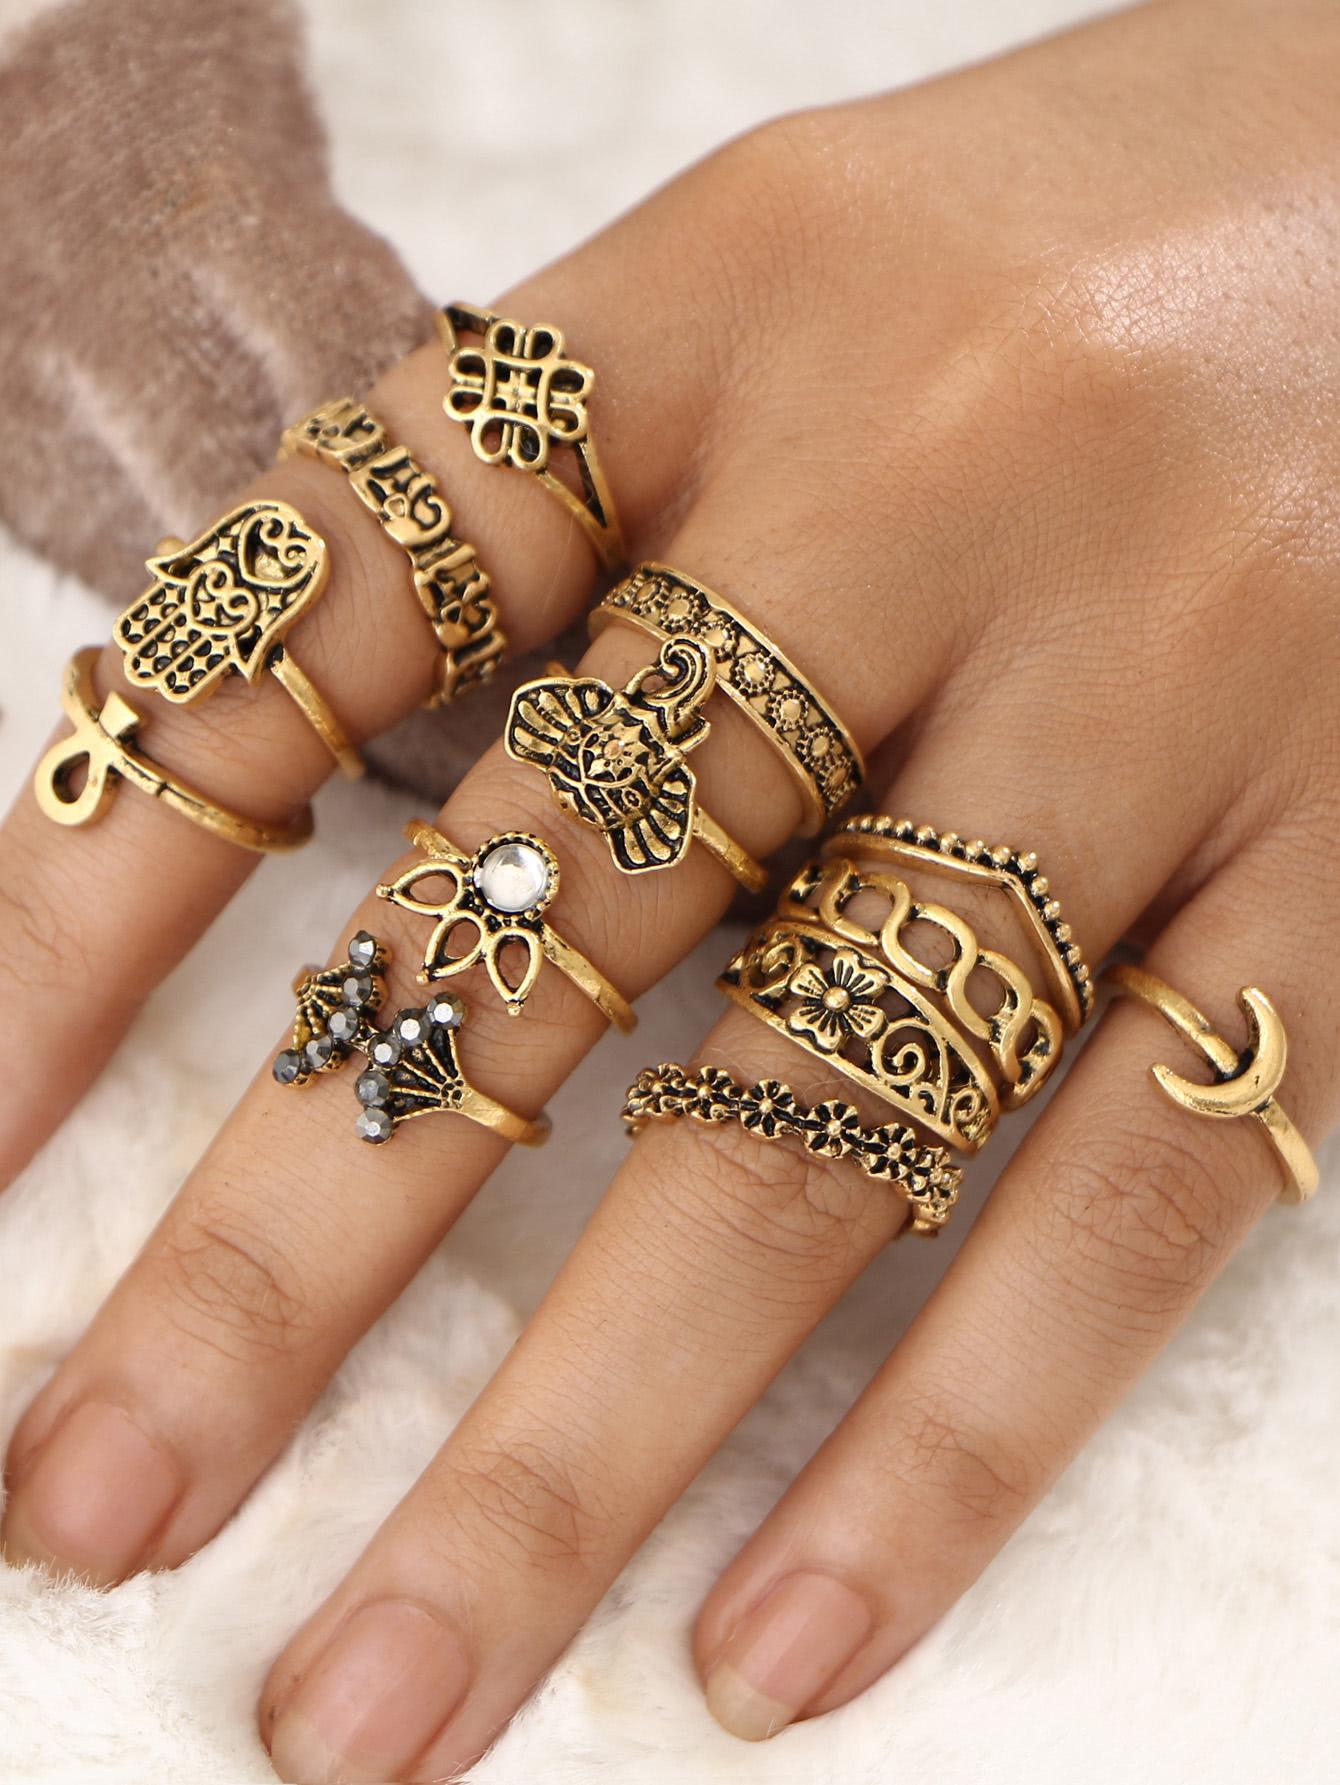 Корона и цветок дизайн кольцо набор 13шт